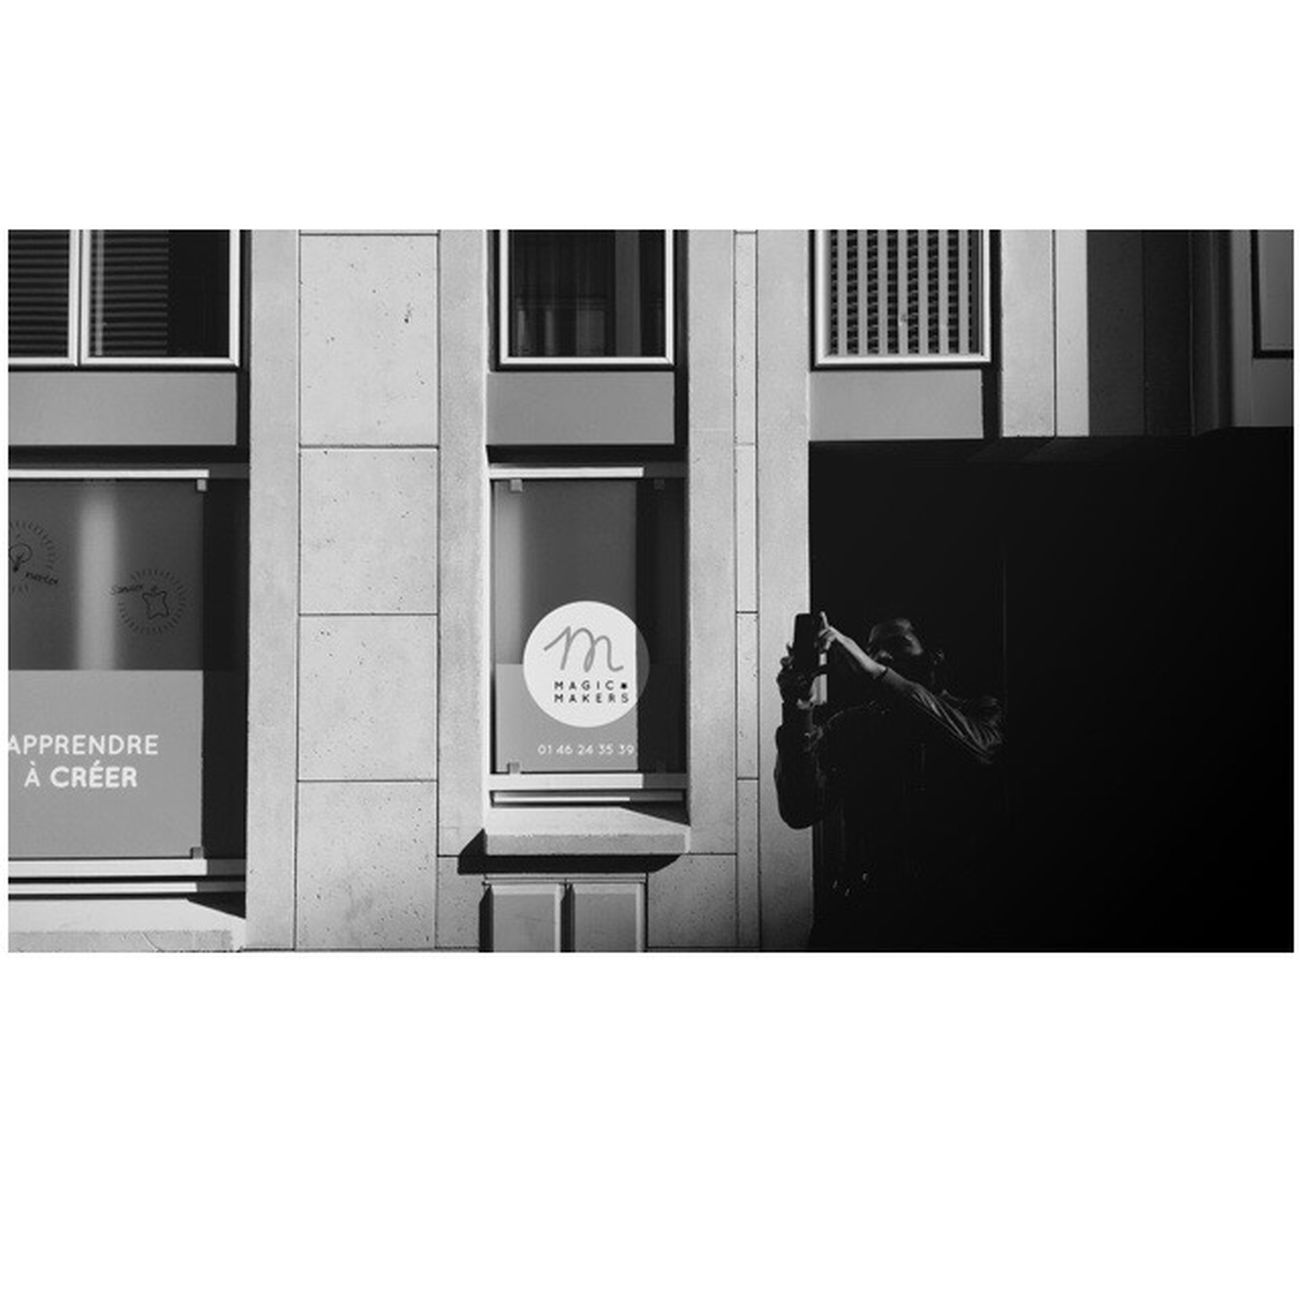 Mobile Camera Club Mobilecameraclub The SmART Gallery Smartphonephotography Blackandwhite Photo Of The Day Black & White B&w Blackandwhite Photography AMPt - Shoot Or Die Parisian Lifestyles City Street EyeEm Best Shots Street_photo_club Everybody Street Everybodystreet Parisian Connexion Wearethestreet Streetphotography IPhoneography Taking Photos Paris City Life Photo